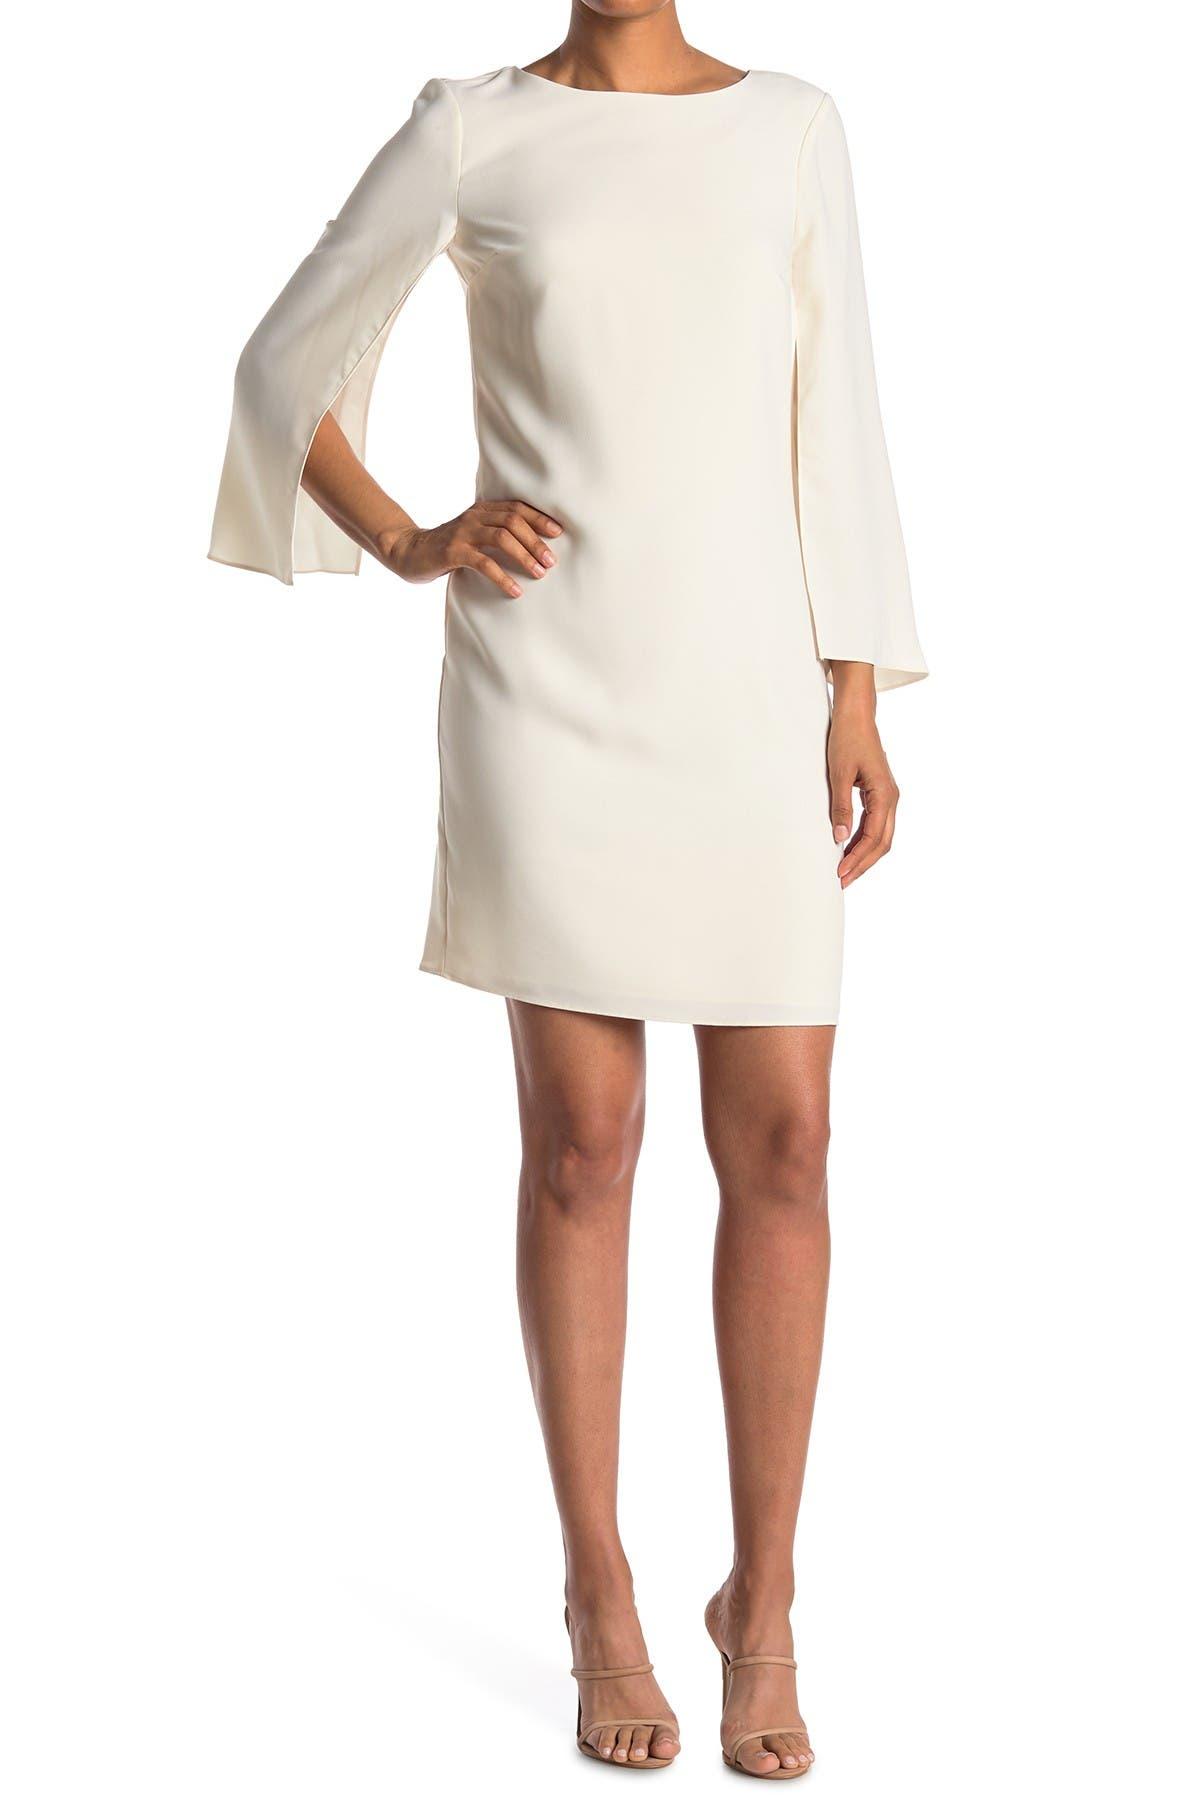 Image of HALSTON Cape Sleeve Sheath Dress